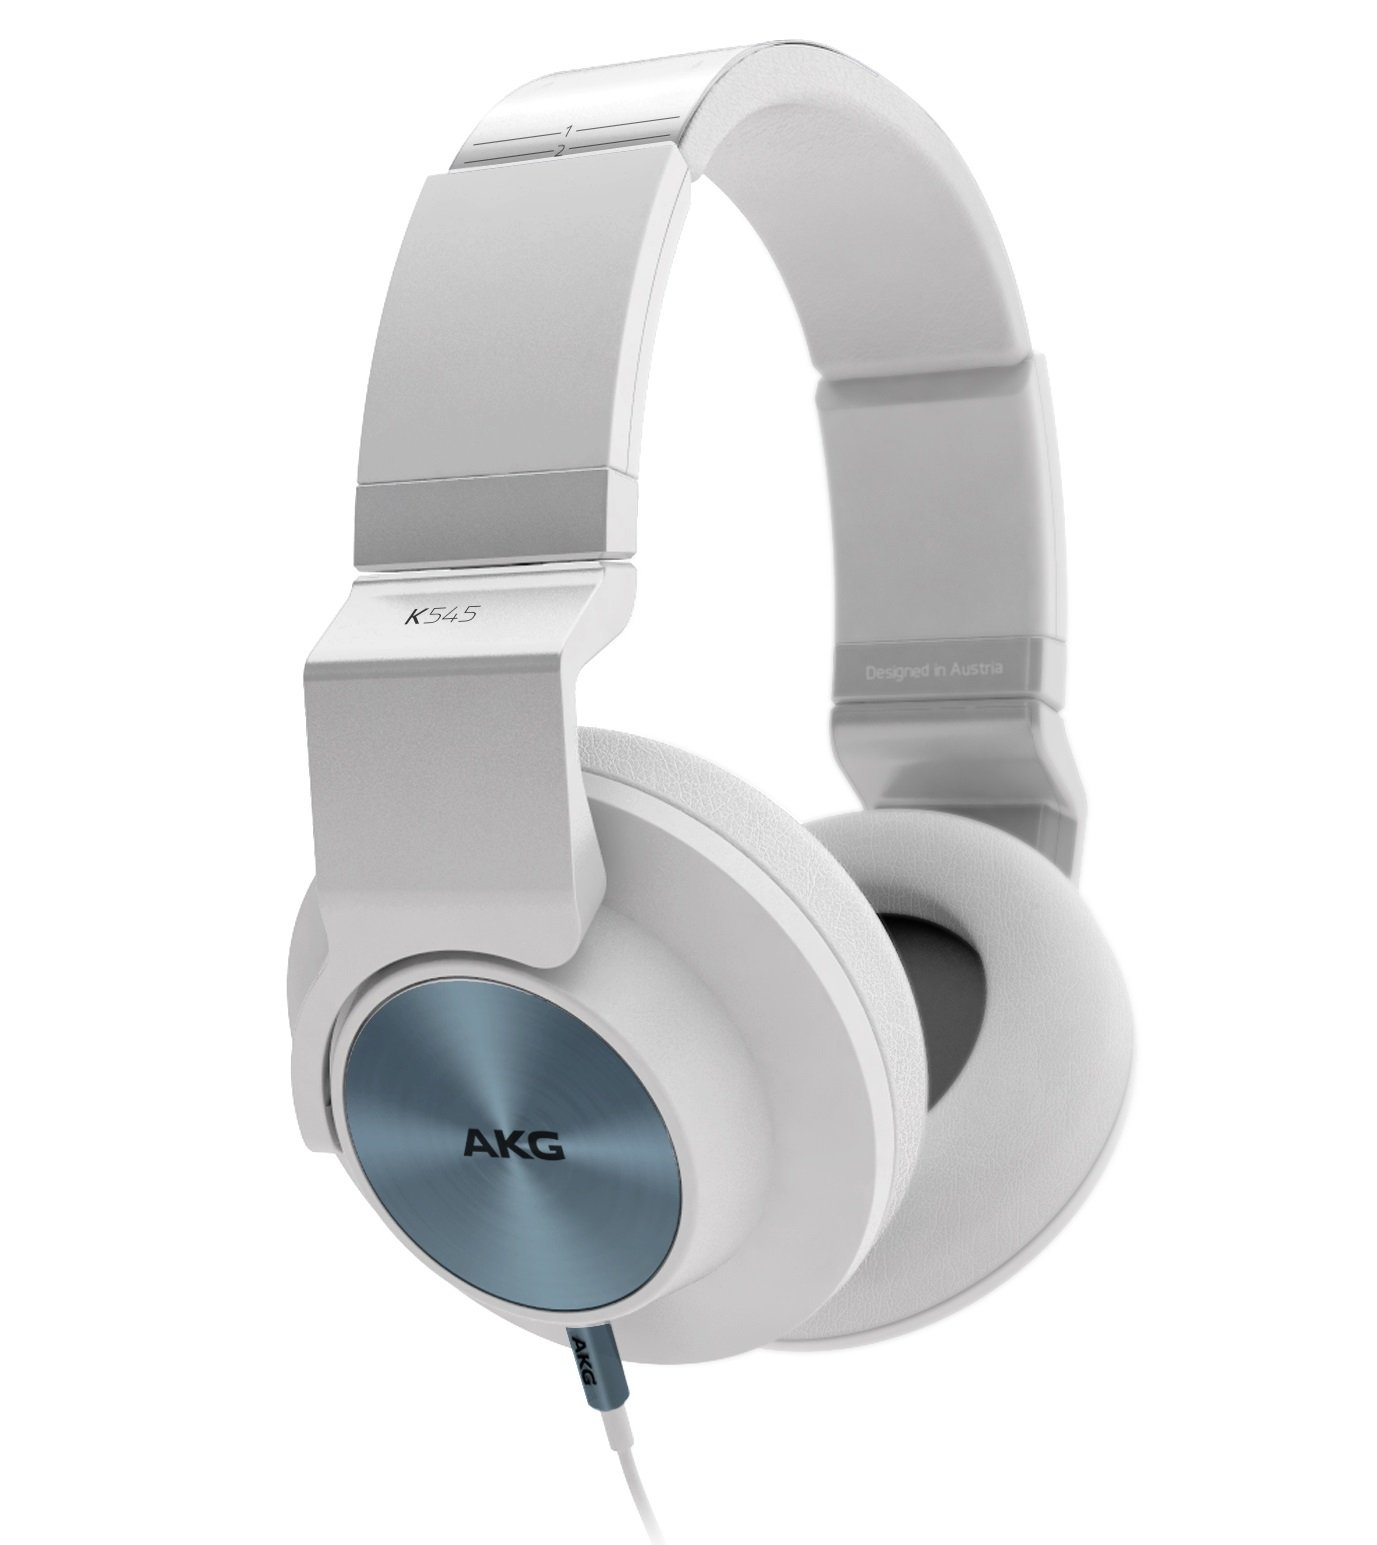 AKG K545 WHT Studio-Quality, Closed-Back, Over the Ear Headphones (White)